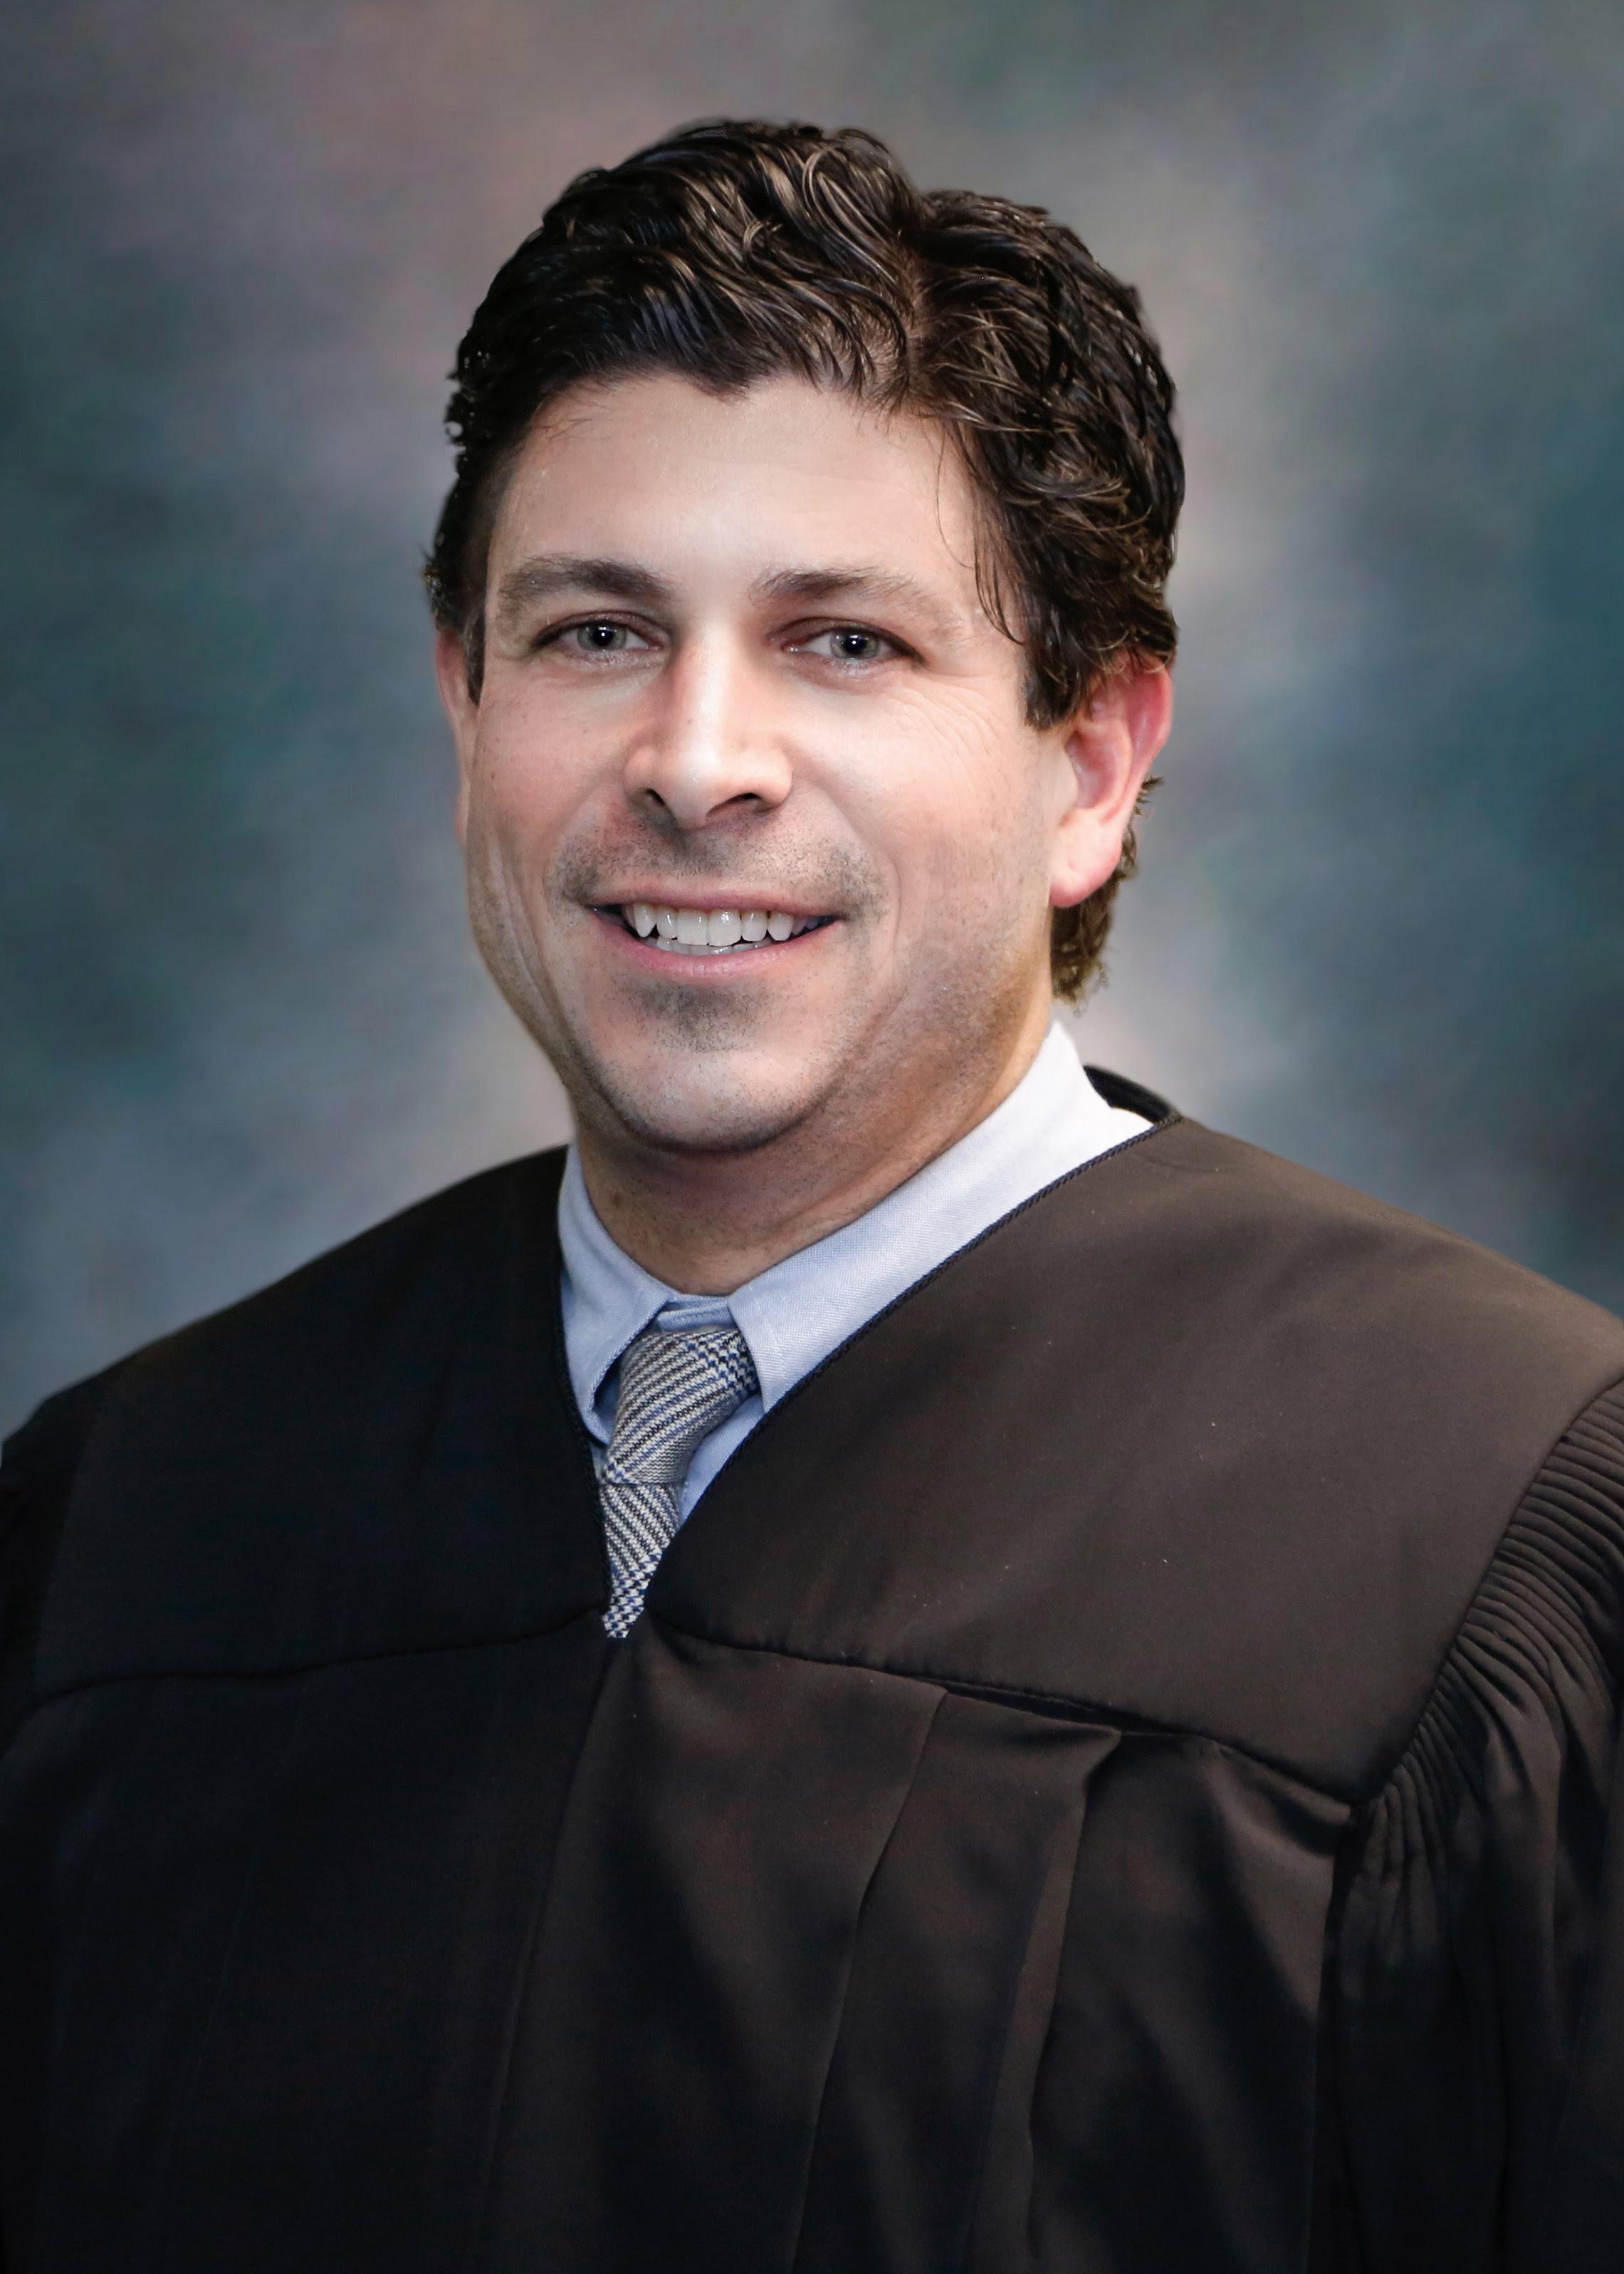 Hon. Jesse J. Marino